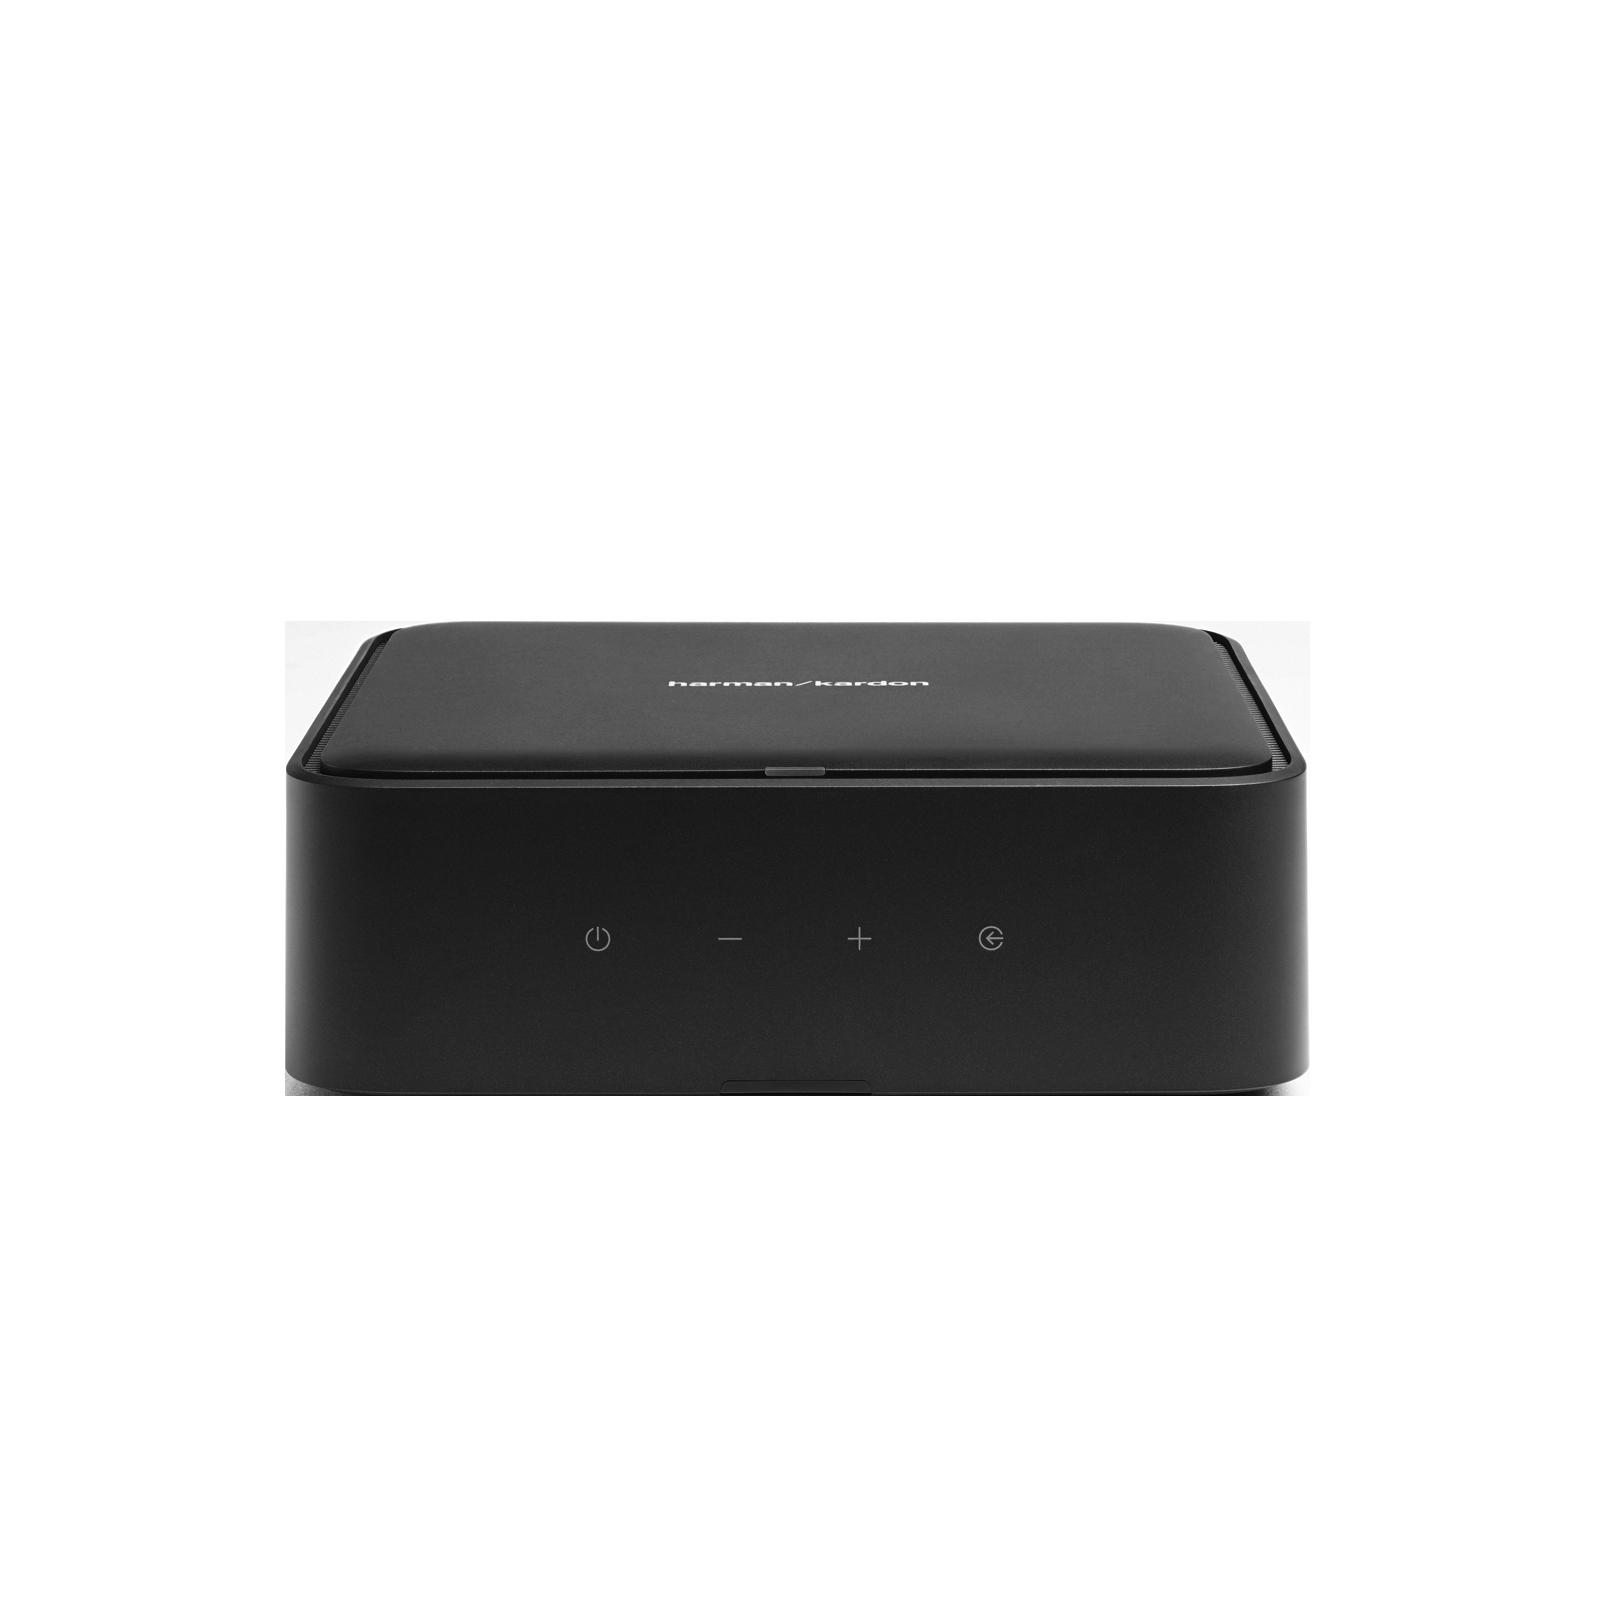 Harman Kardon Citation Amp - Black - High-power, wireless streaming stereo amplifier - Front